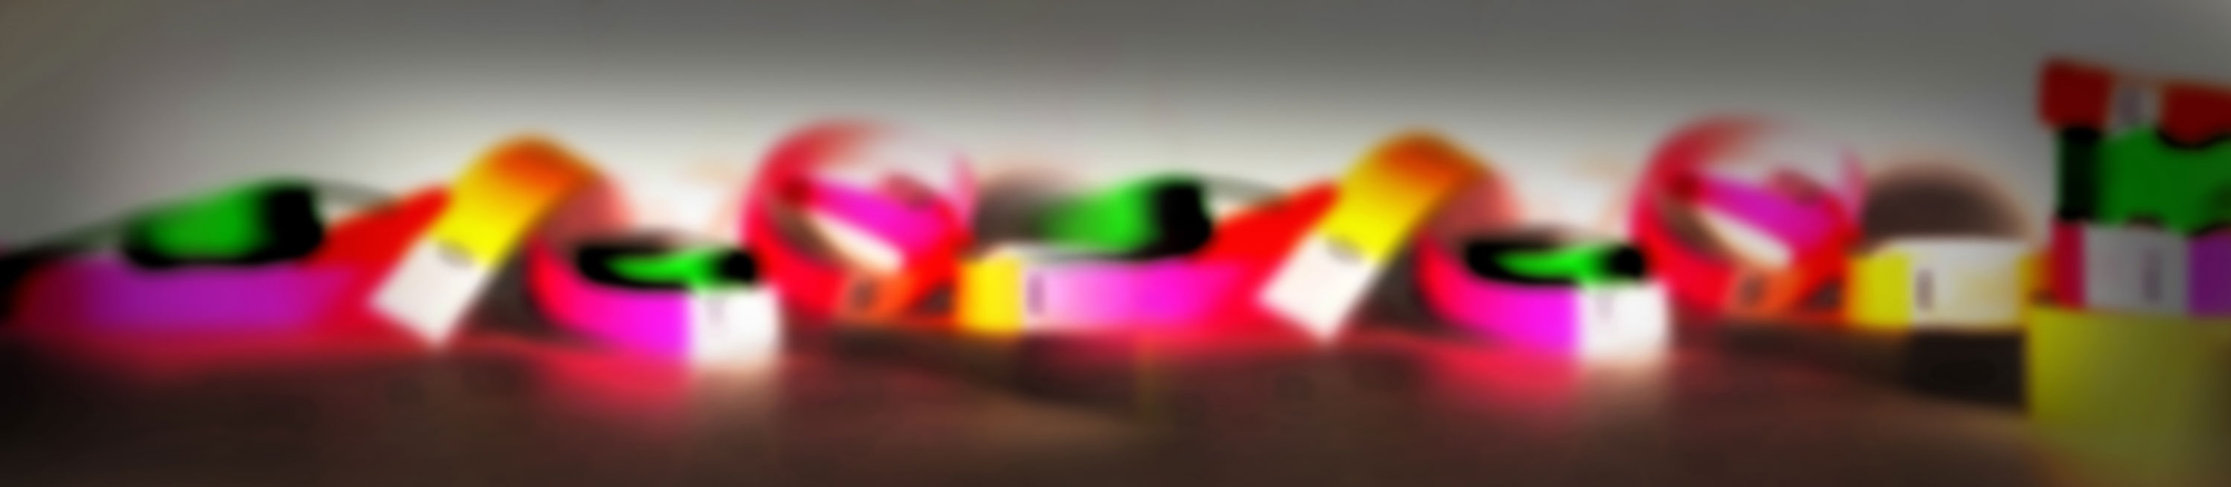 Wristband-Background.jpg